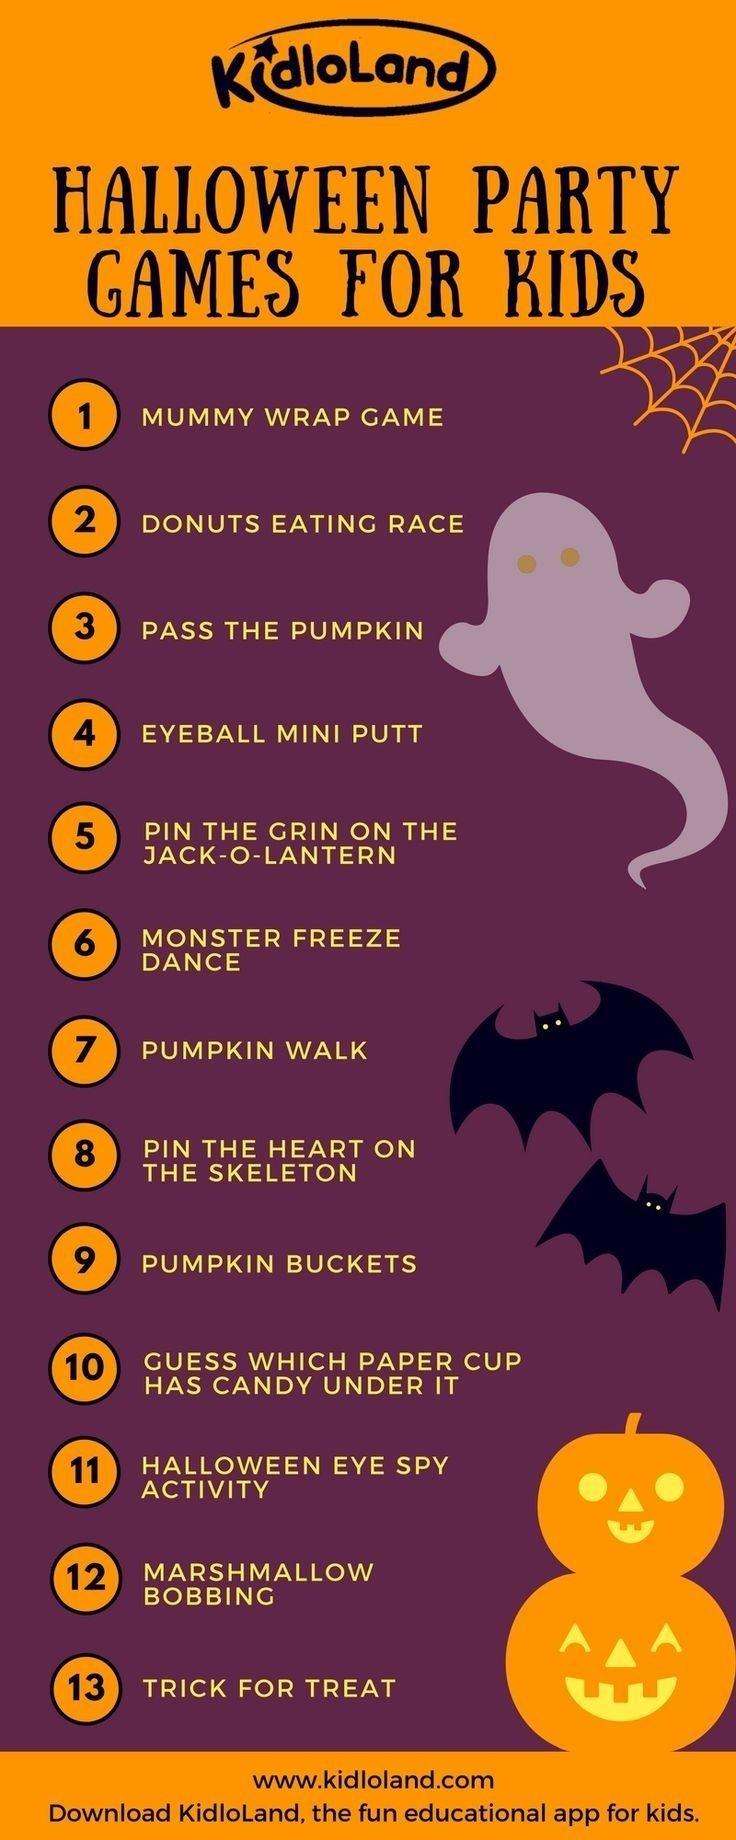 13 fun halloween party games for kids | halloween ideas, halloween